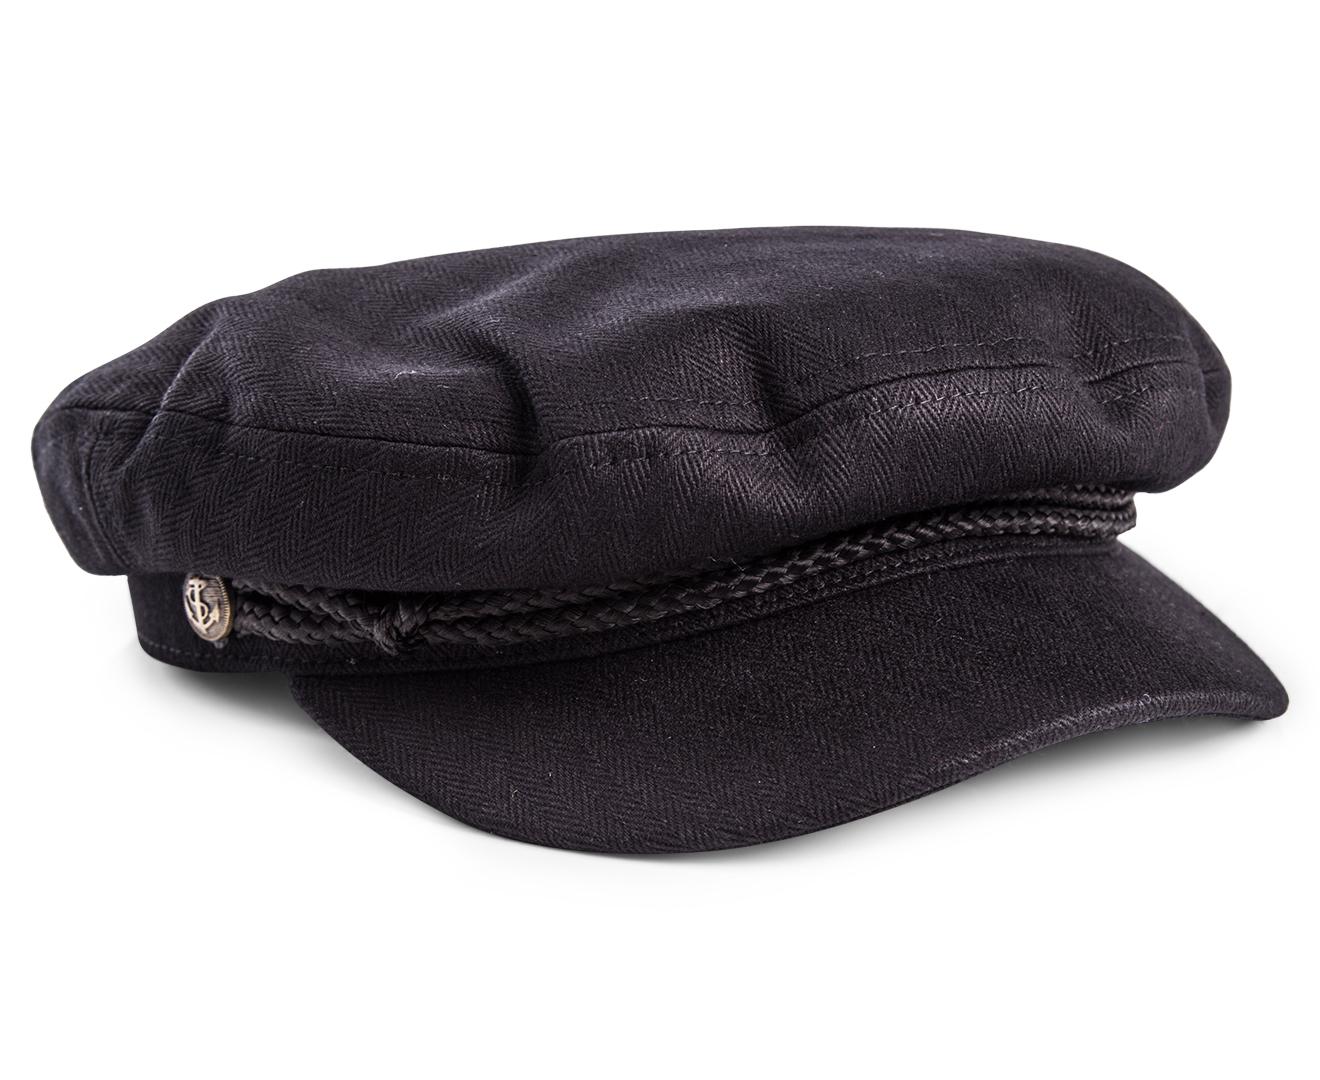 Brixton Fiddler Cap - Black Herringbone Twill  058de5aac521